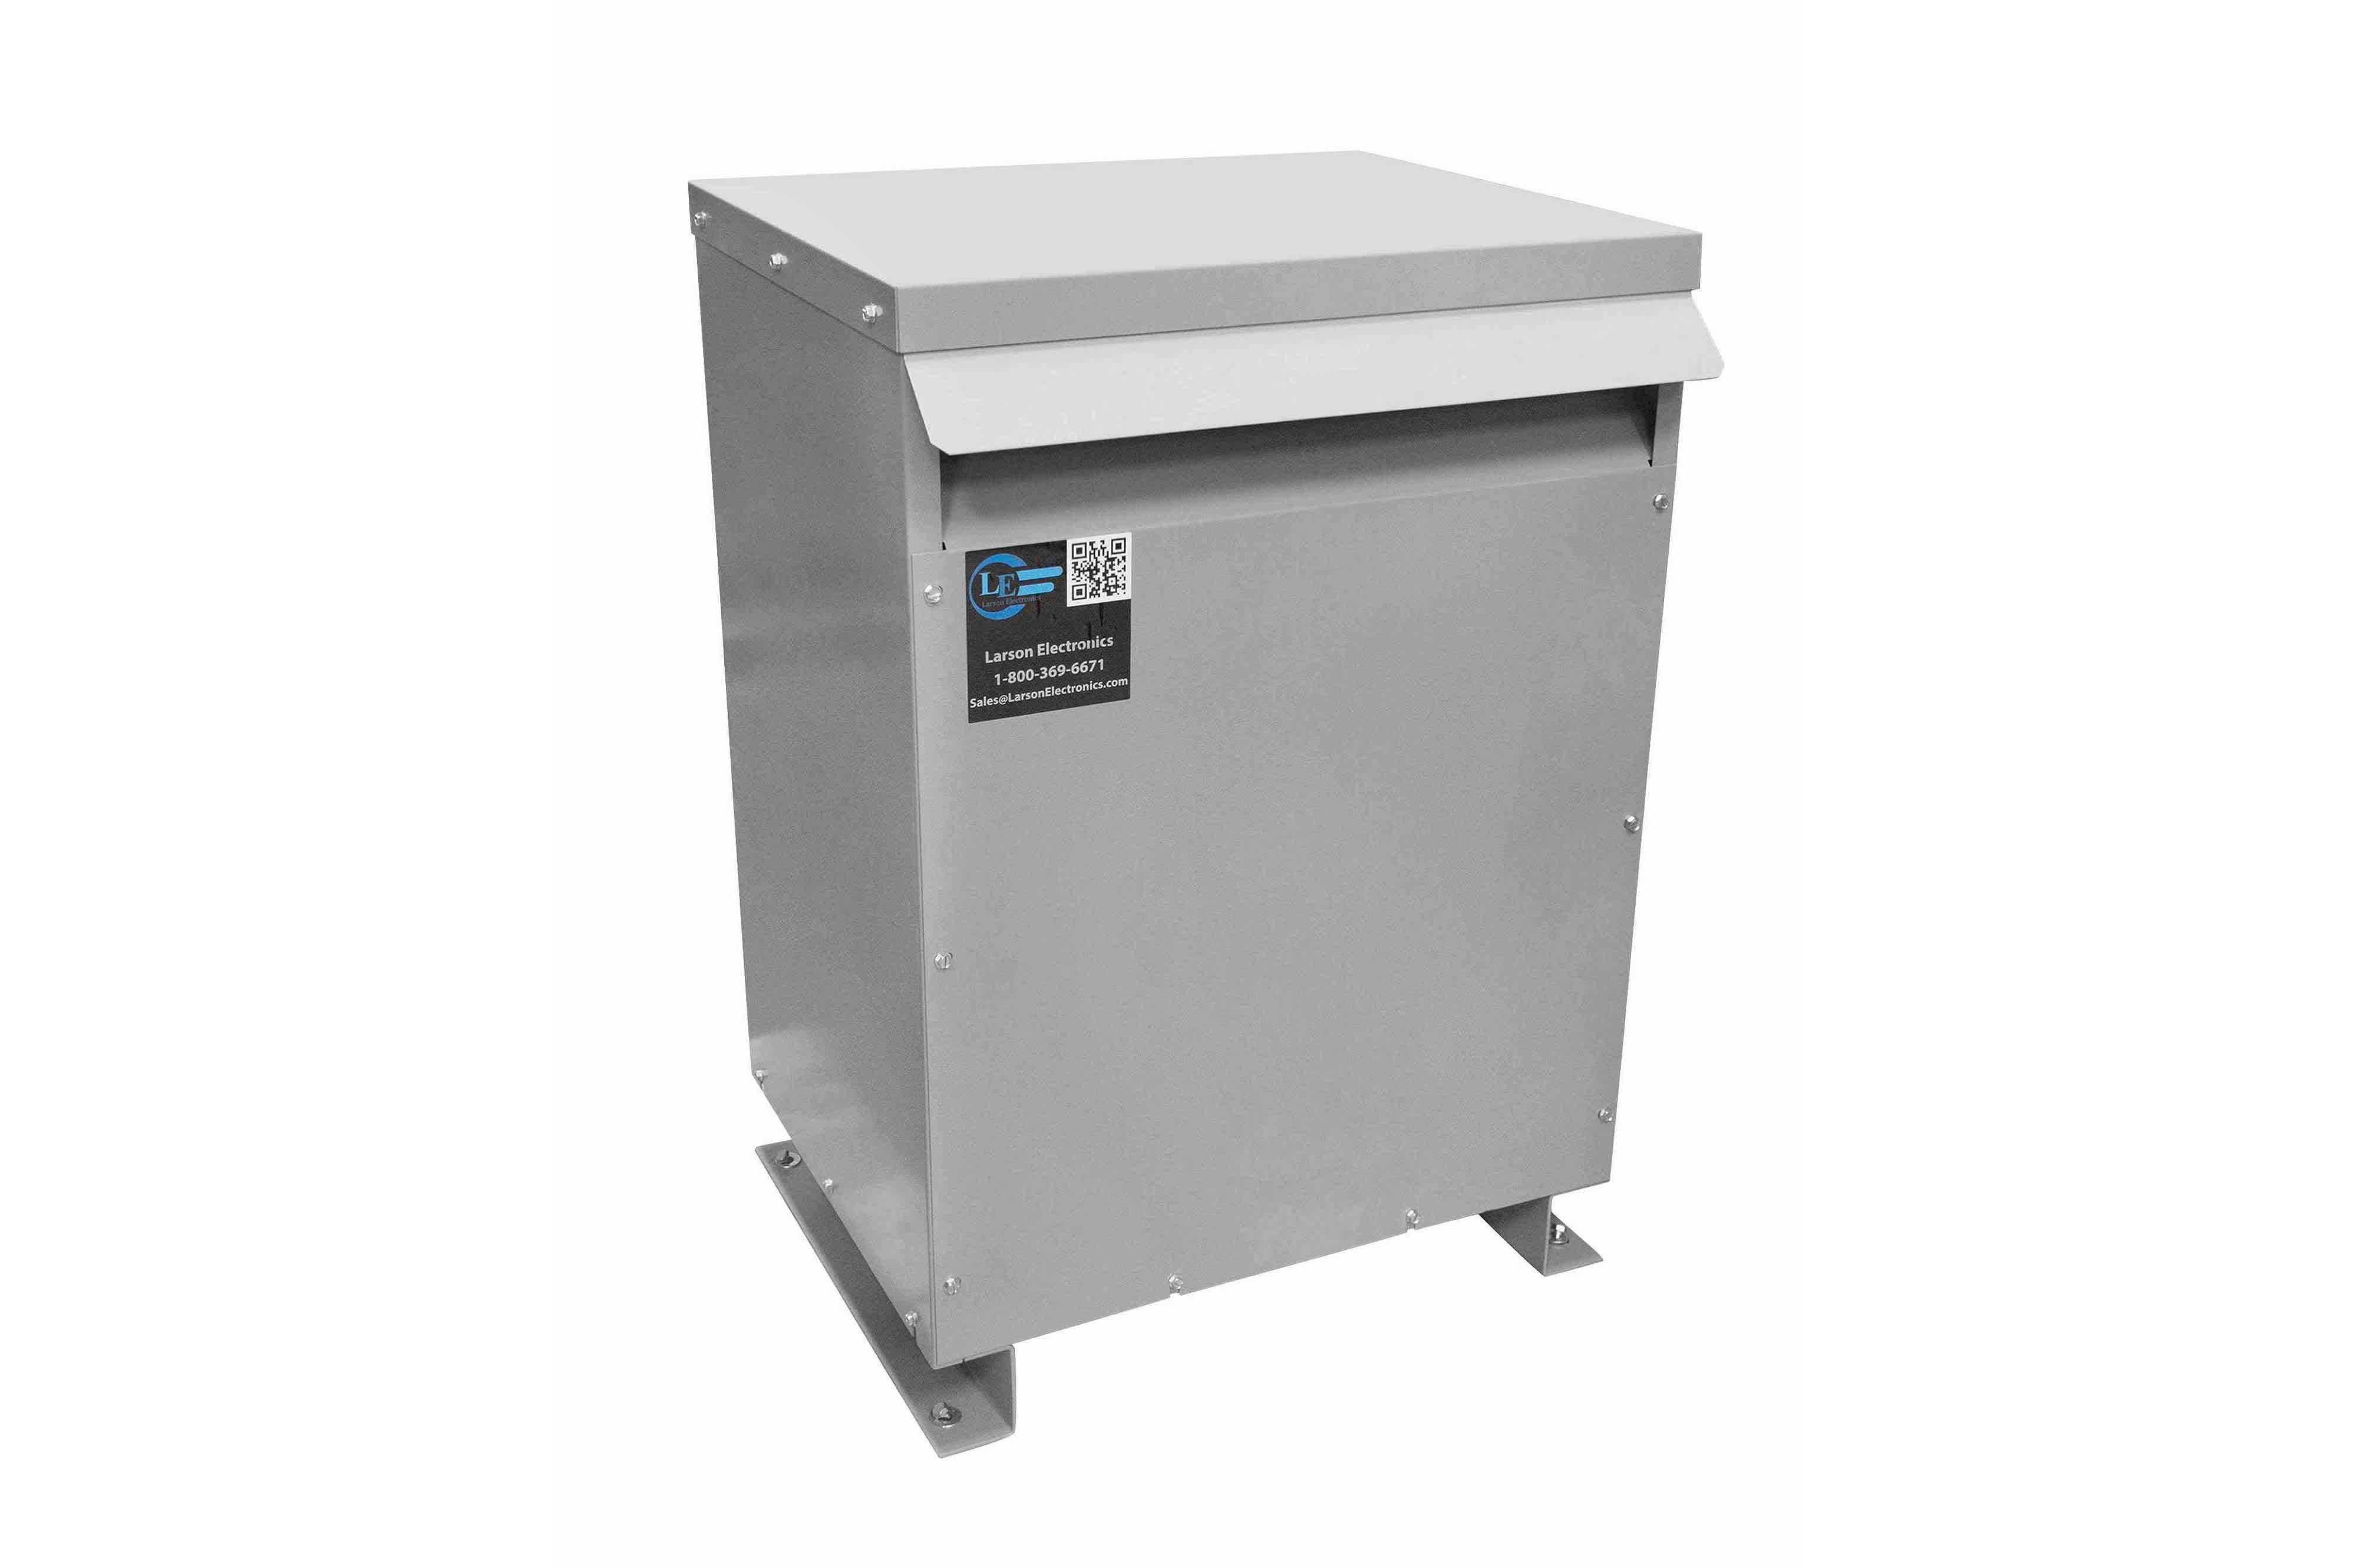 750 kVA 3PH Isolation Transformer, 208V Wye Primary, 380Y/220 Wye-N Secondary, N3R, Ventilated, 60 Hz